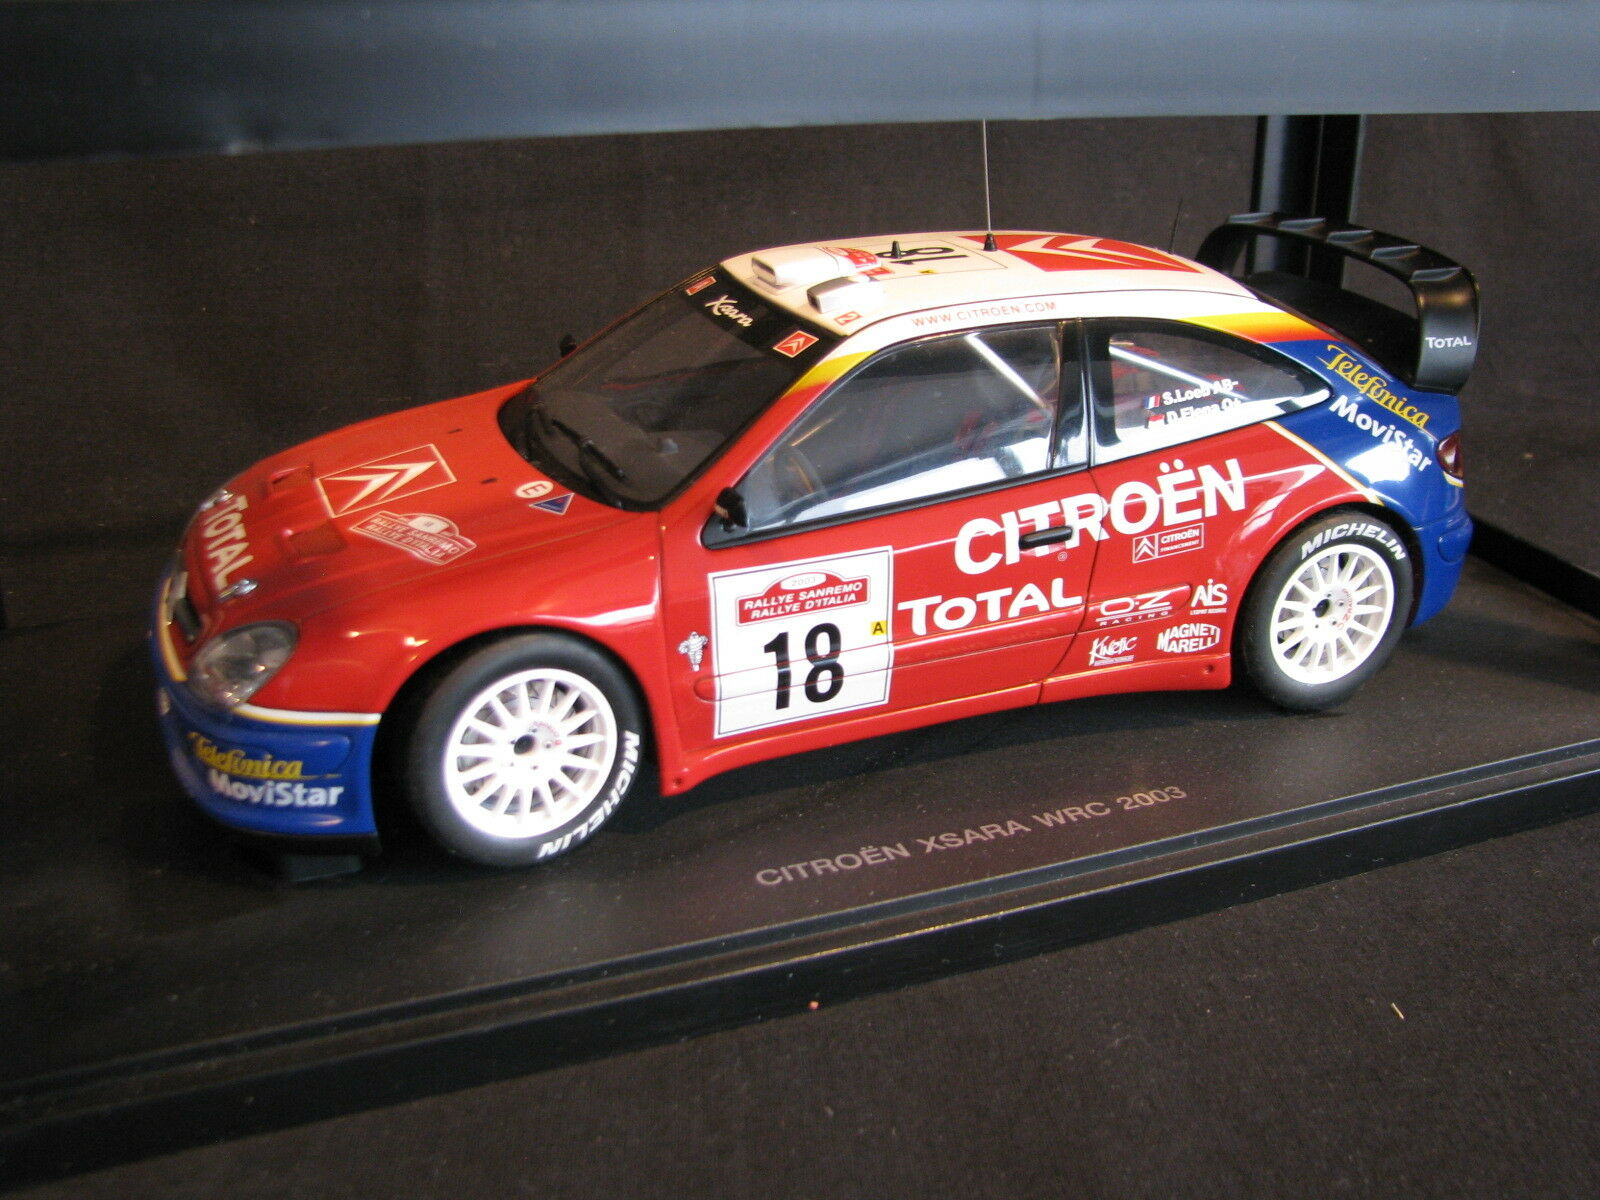 AutoArt Citroën Xsara WRC 2003 1 18  18 Loeb   Elena Sanremo Rally (AK)